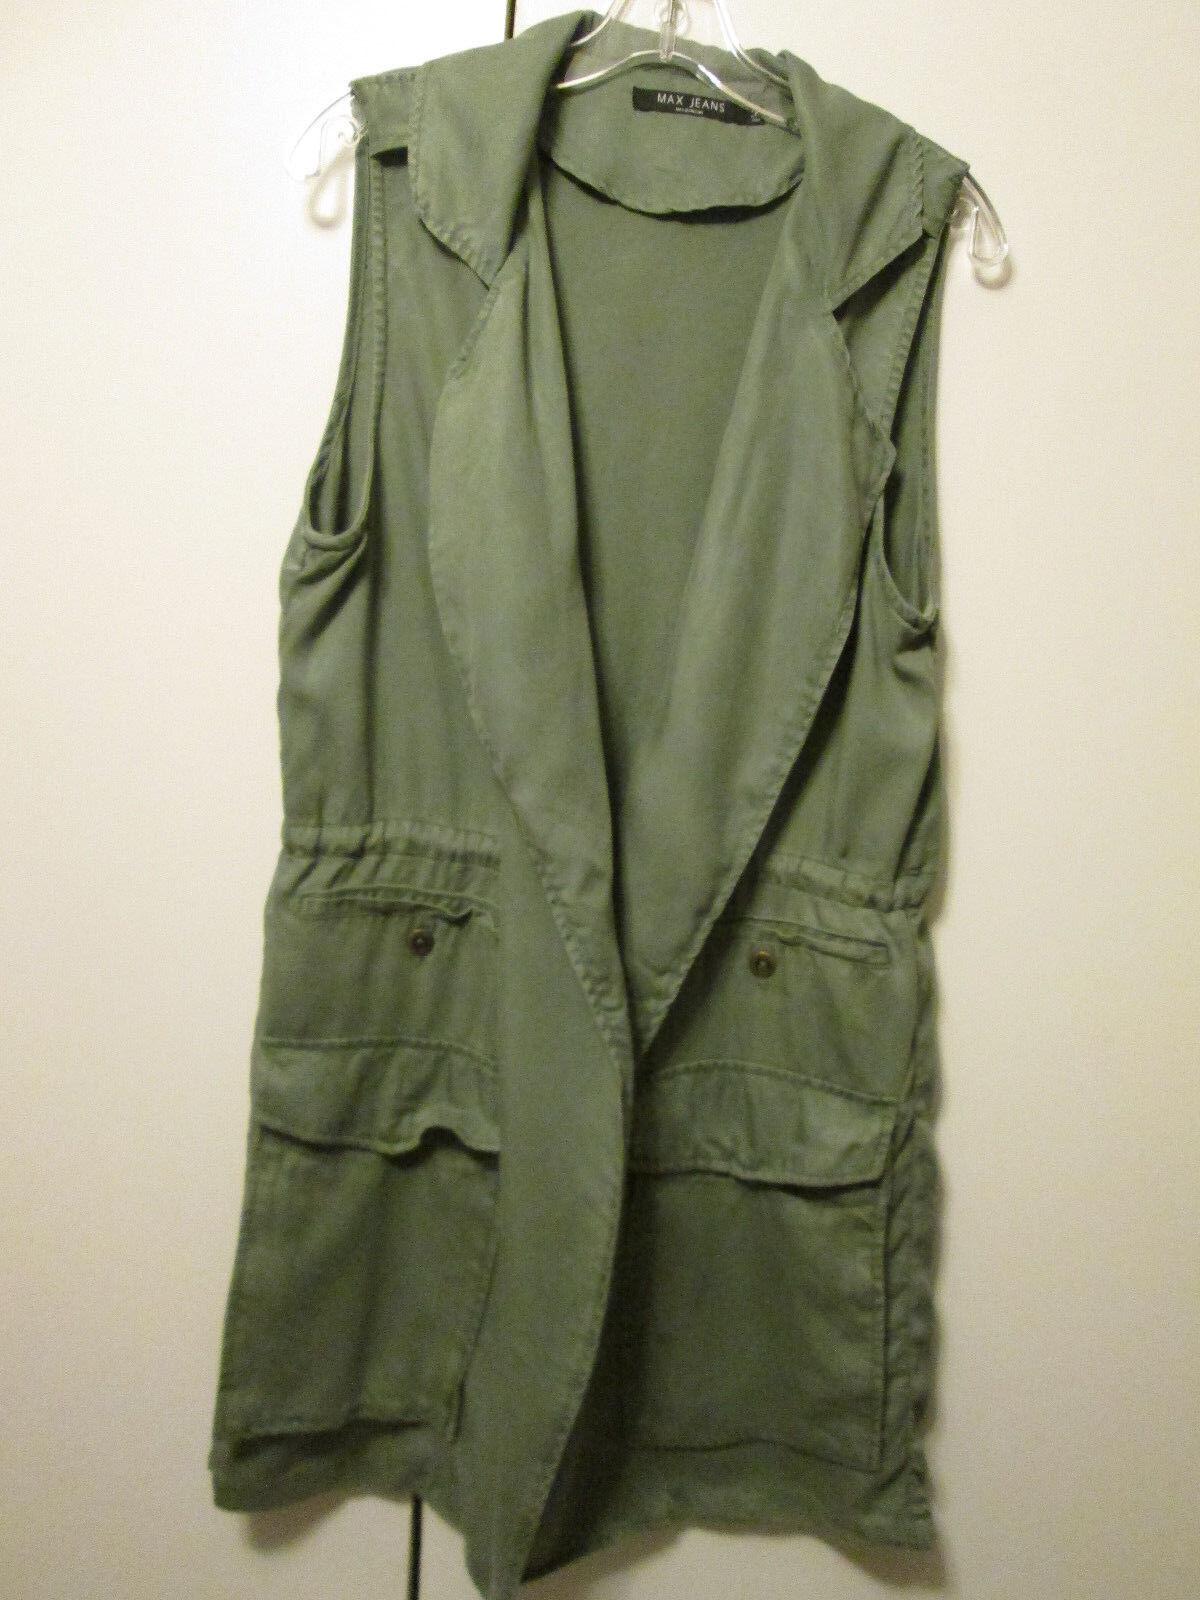 $105 Max Jeans Mint Green Olive Khaki Tencel Extra